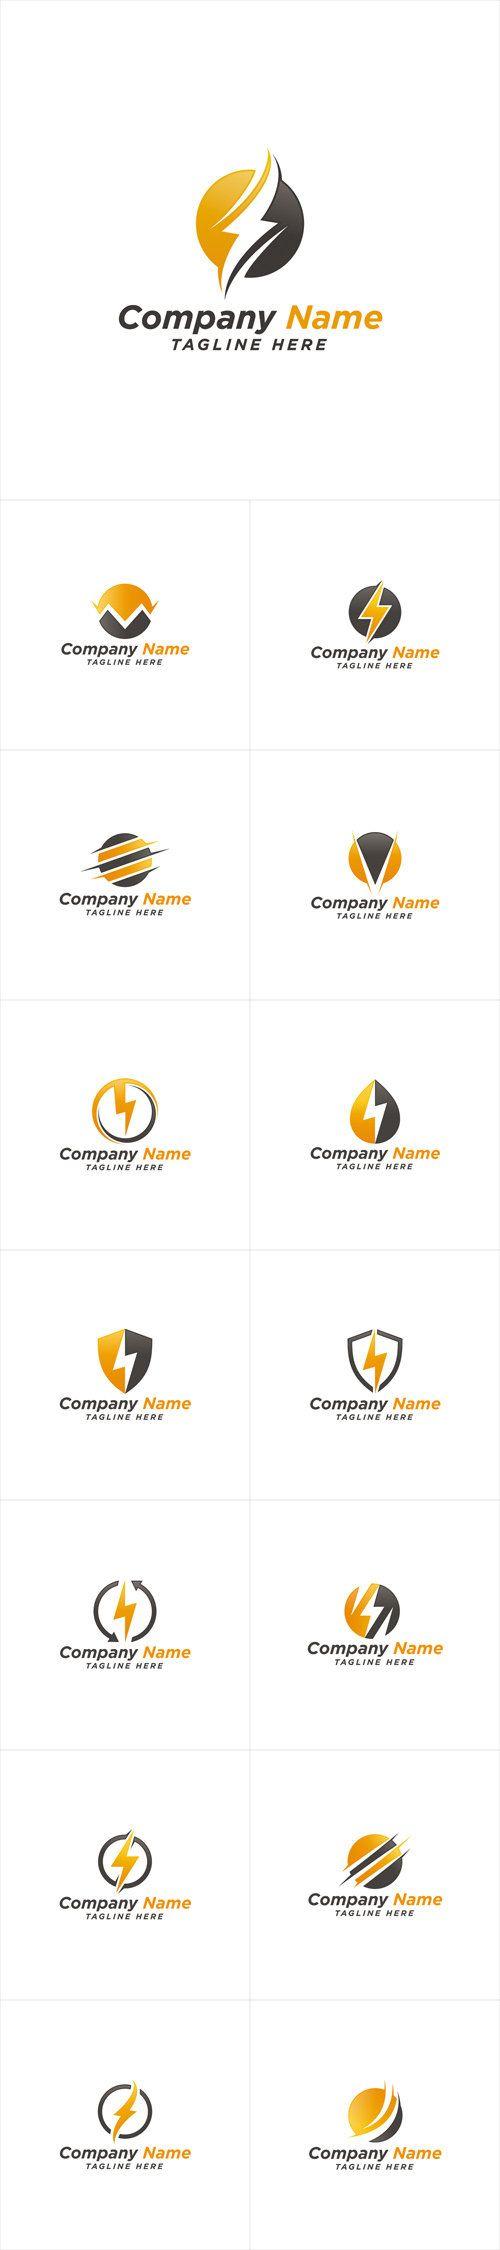 Vectors - Electric Energy Power Logo Design